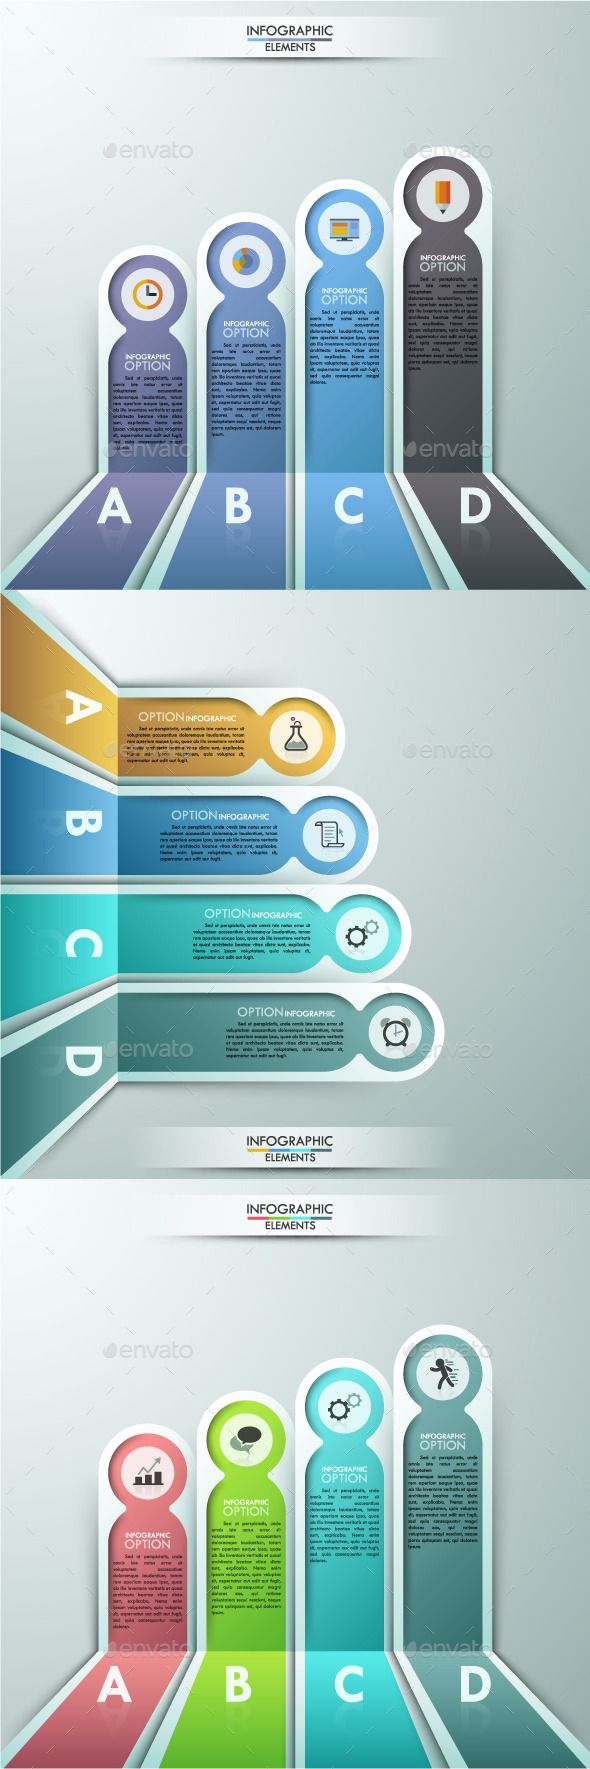 Modern Infographics Paper Template (3 Items) #design Download: http://graphicriver.net/item/modern-infographics-paper-template-3-items/13234221?ref=ksioks